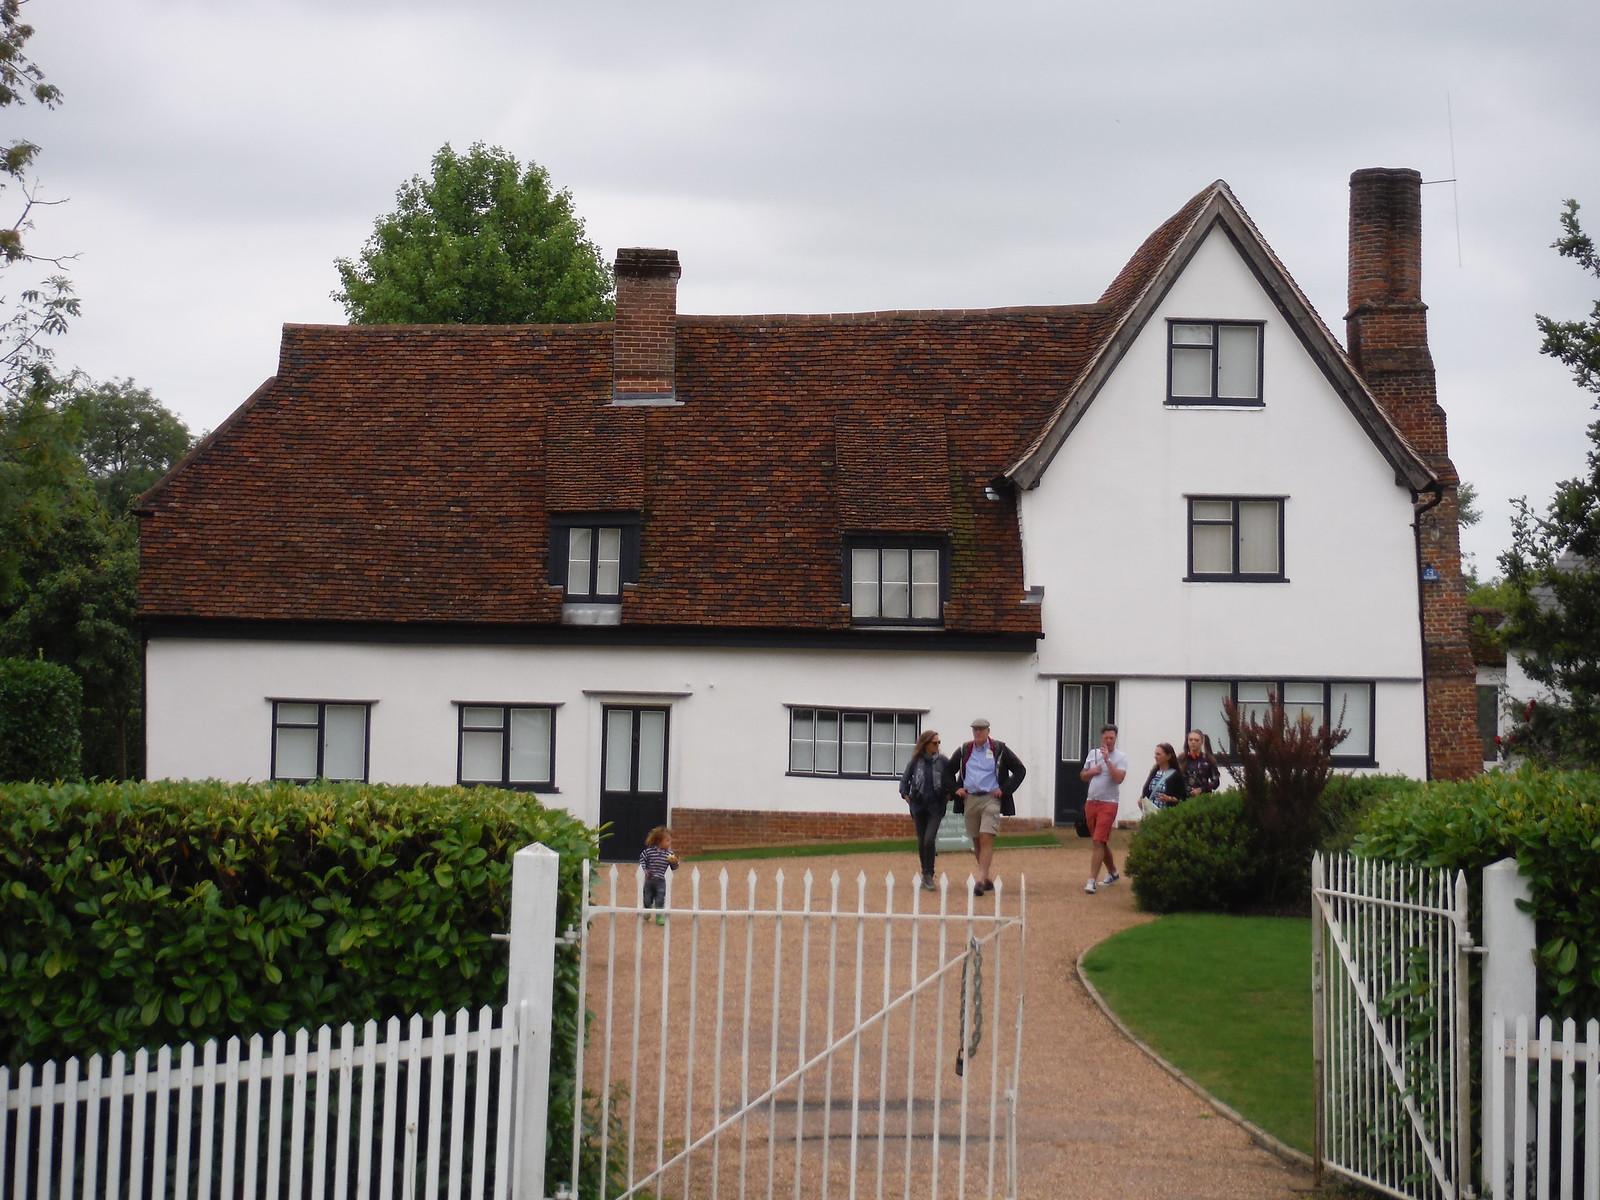 Hoglands, Henry Moore's home SWC Walk 164 Roydon to Sawbridgeworth via Henry Moore Foundation